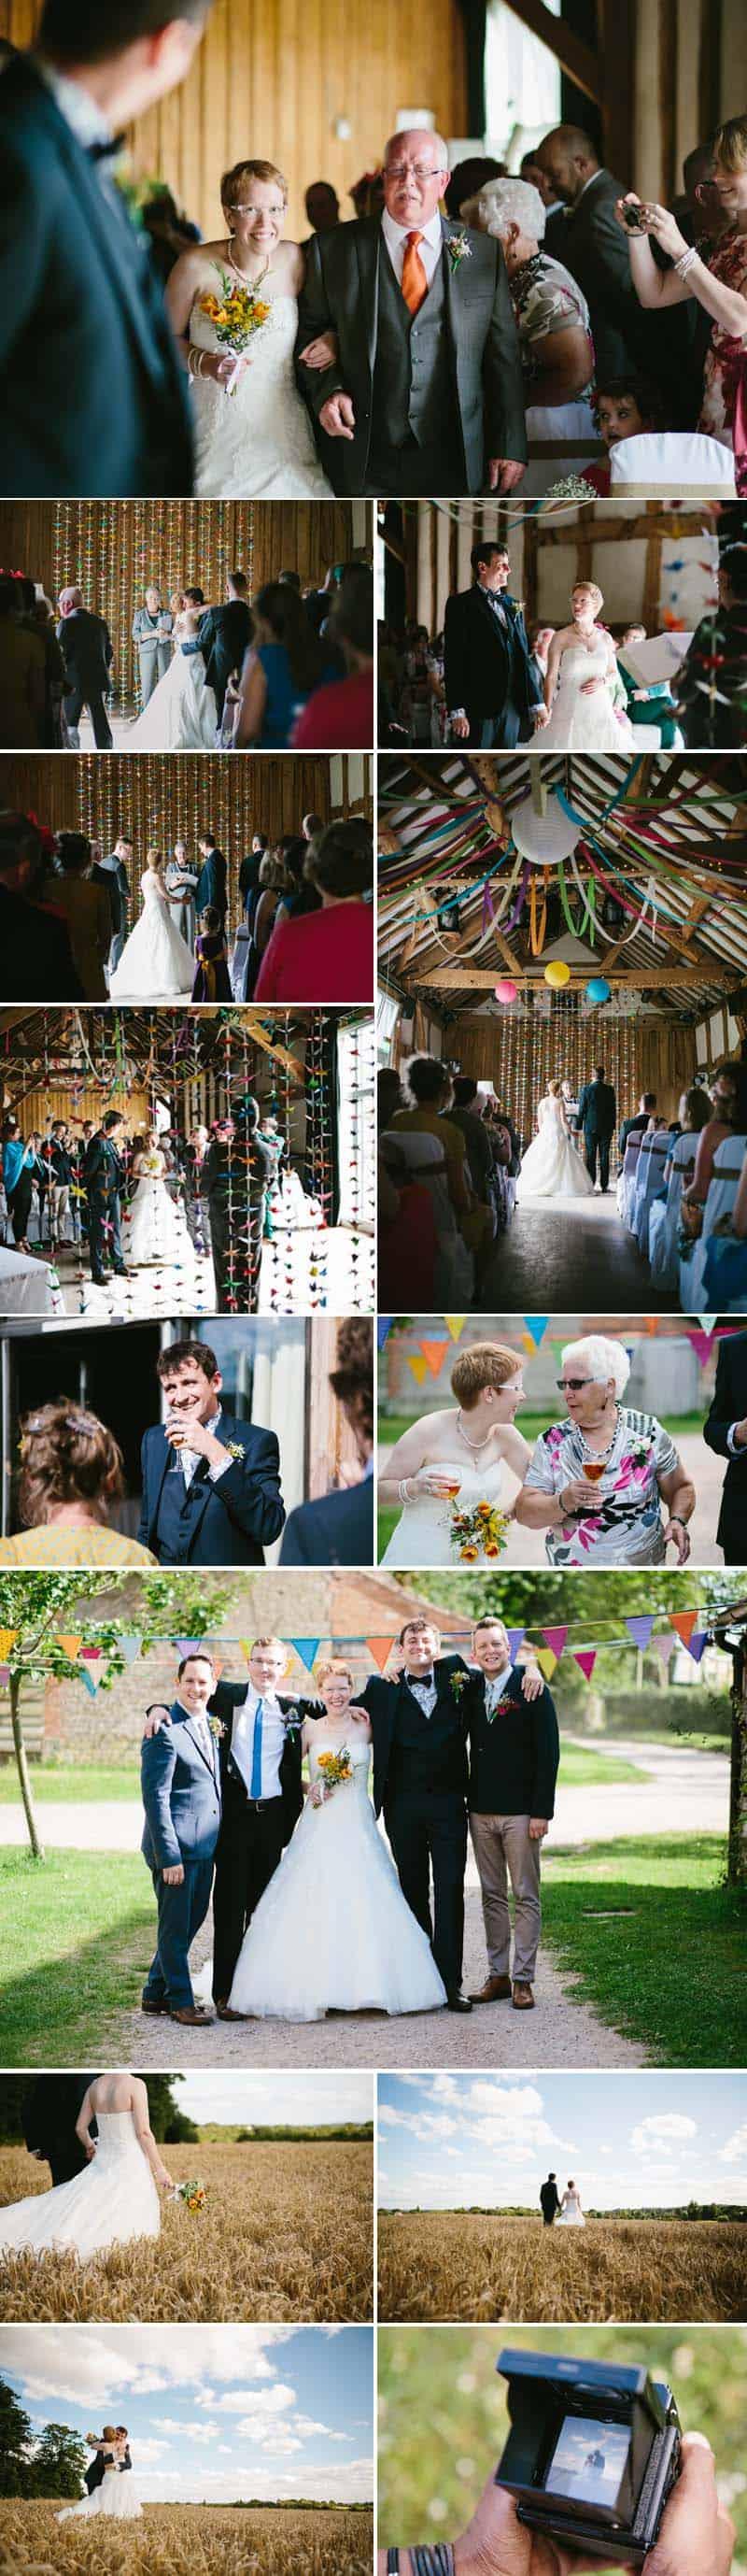 A Handmade Barn Wedding With A Thousand Paper Cranes